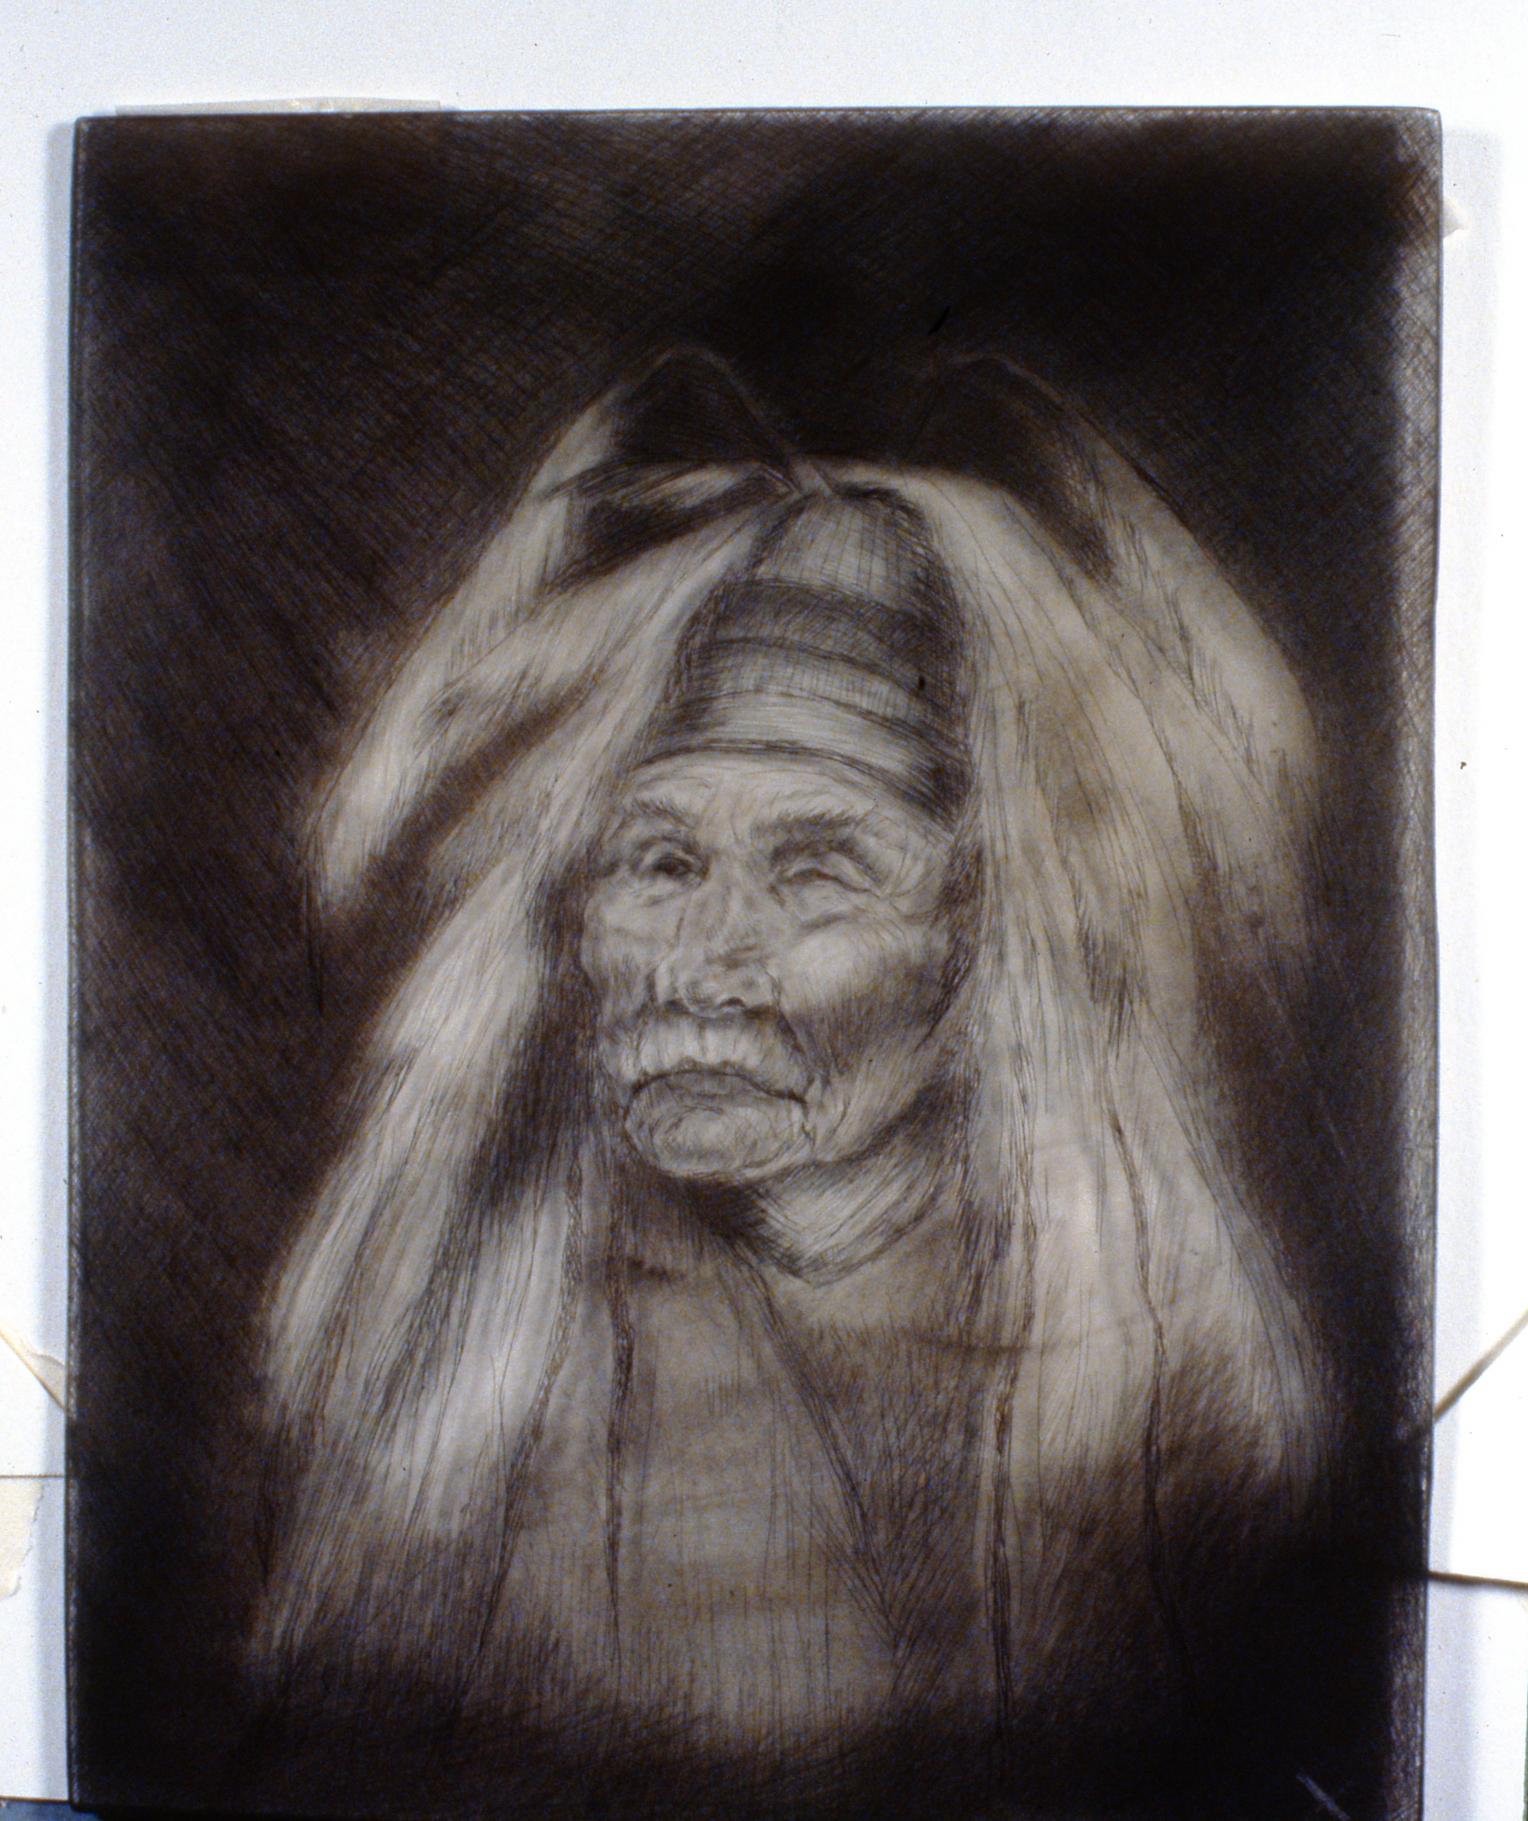 Shaman, 1980, Minn Sjølseth, retired plate (plastic), 25 x 20 cm, 1996.02.14